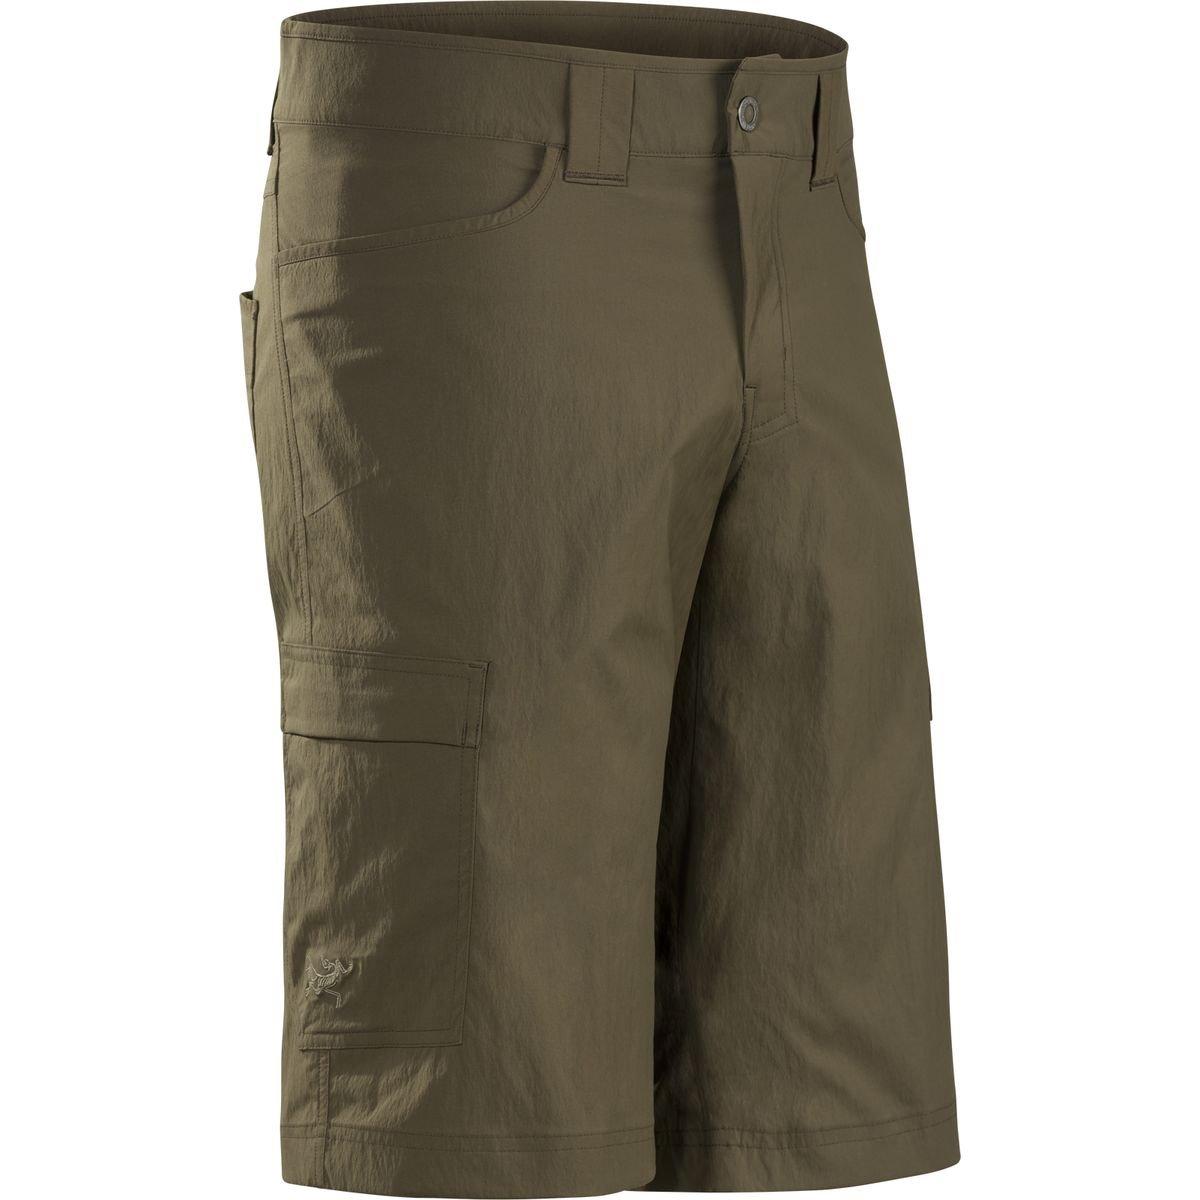 46467088643 Arc'teryx Rampart Long Short, Mens, Black: Amazon.ca: Sports & Outdoors